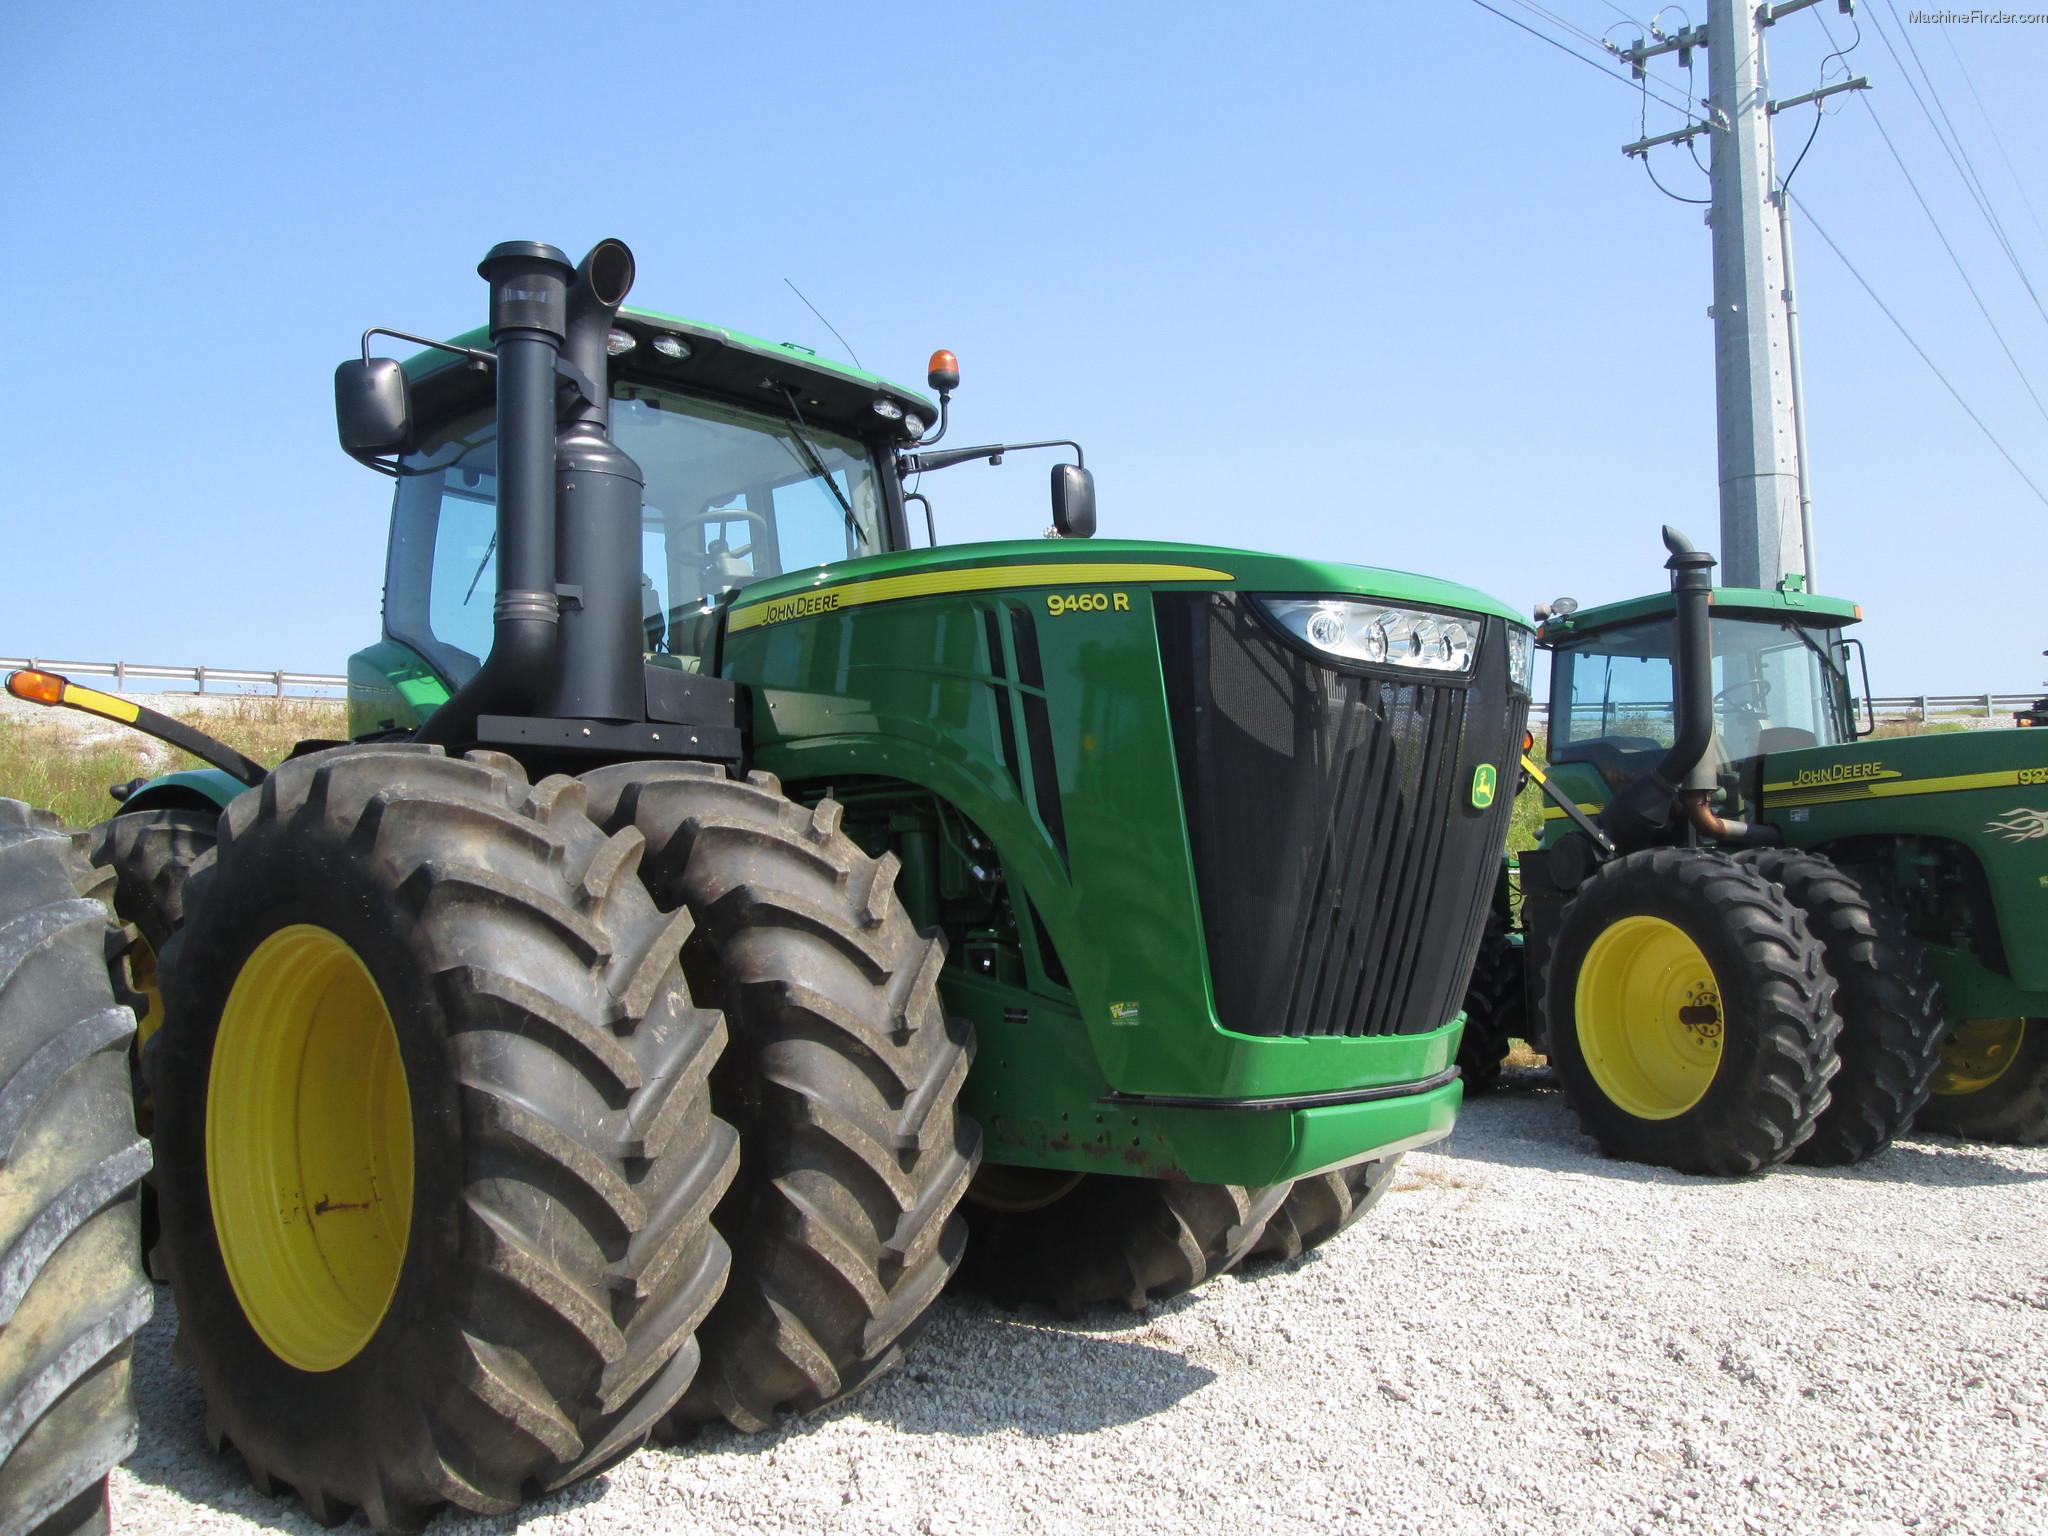 2013 John Deere 9460R Tractors - Articulated 4WD - John ...